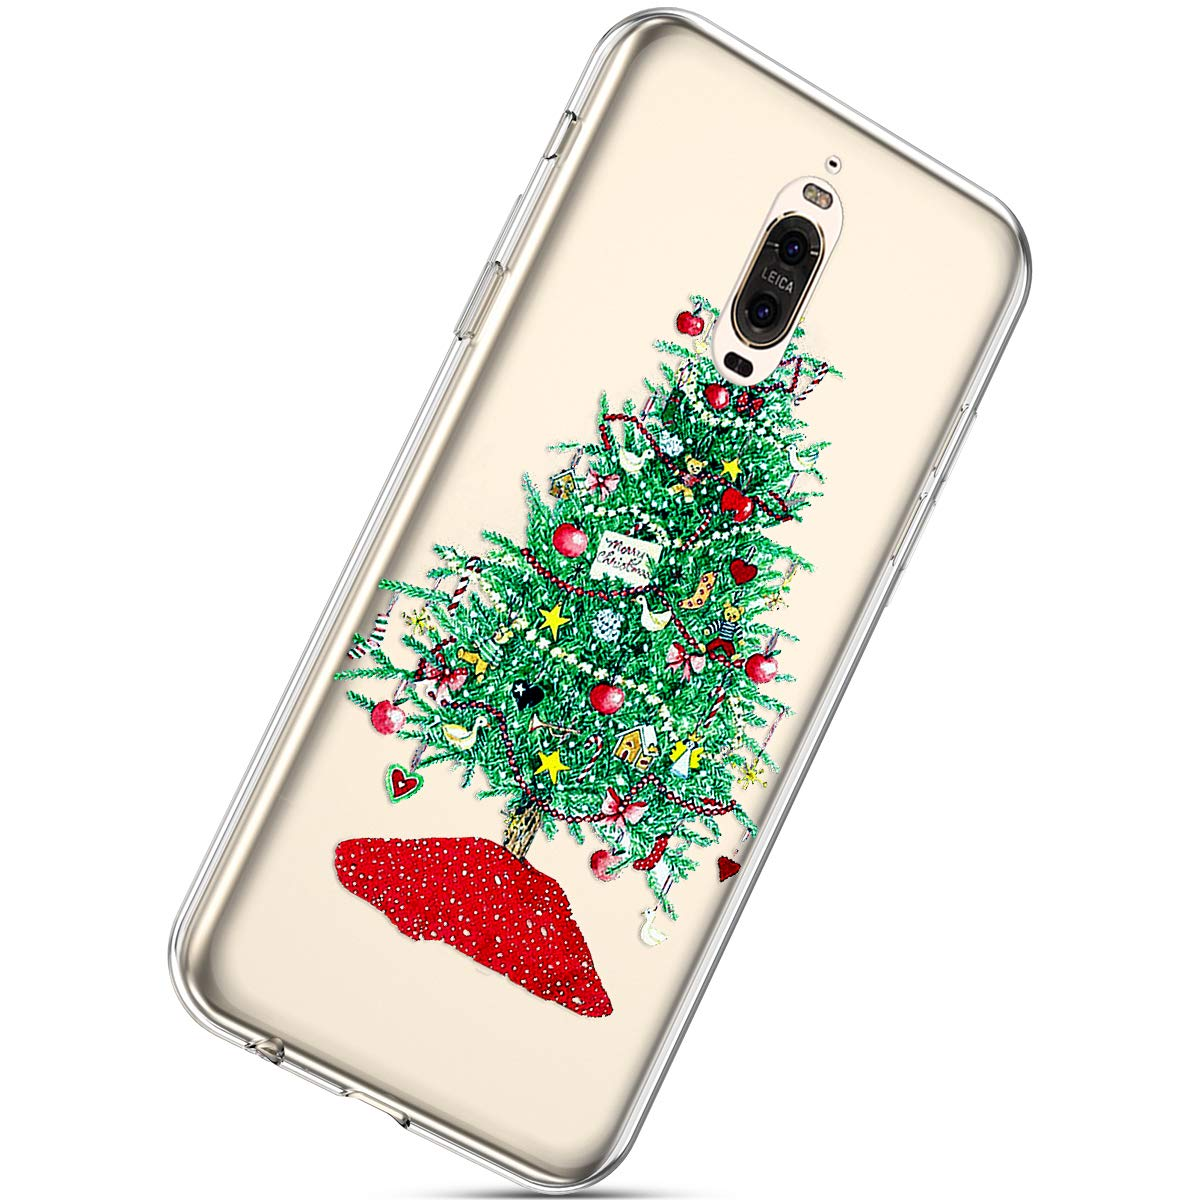 Herbests Coque Silicone pour Huawei Mate 9 Pro Housse avec Noël Motif Ultra Mince Clear Transparent Anti Choc Bumper Coque Case pour Huawei Mate 9 Pro,Noël #17 Noël #17 HER0028065